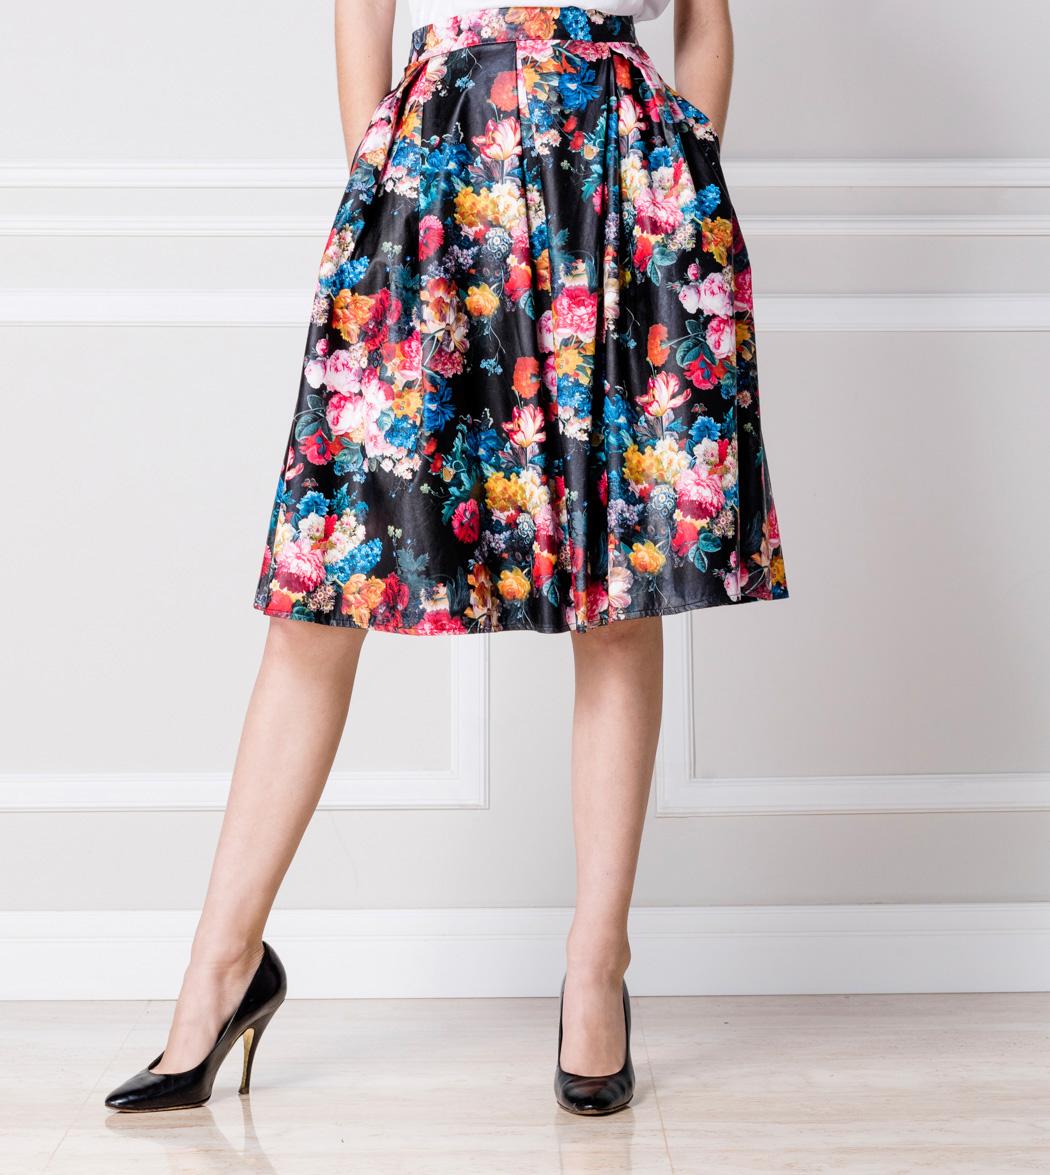 en venta 43b20 2d587 Falda de flores — Nathalia Forkin